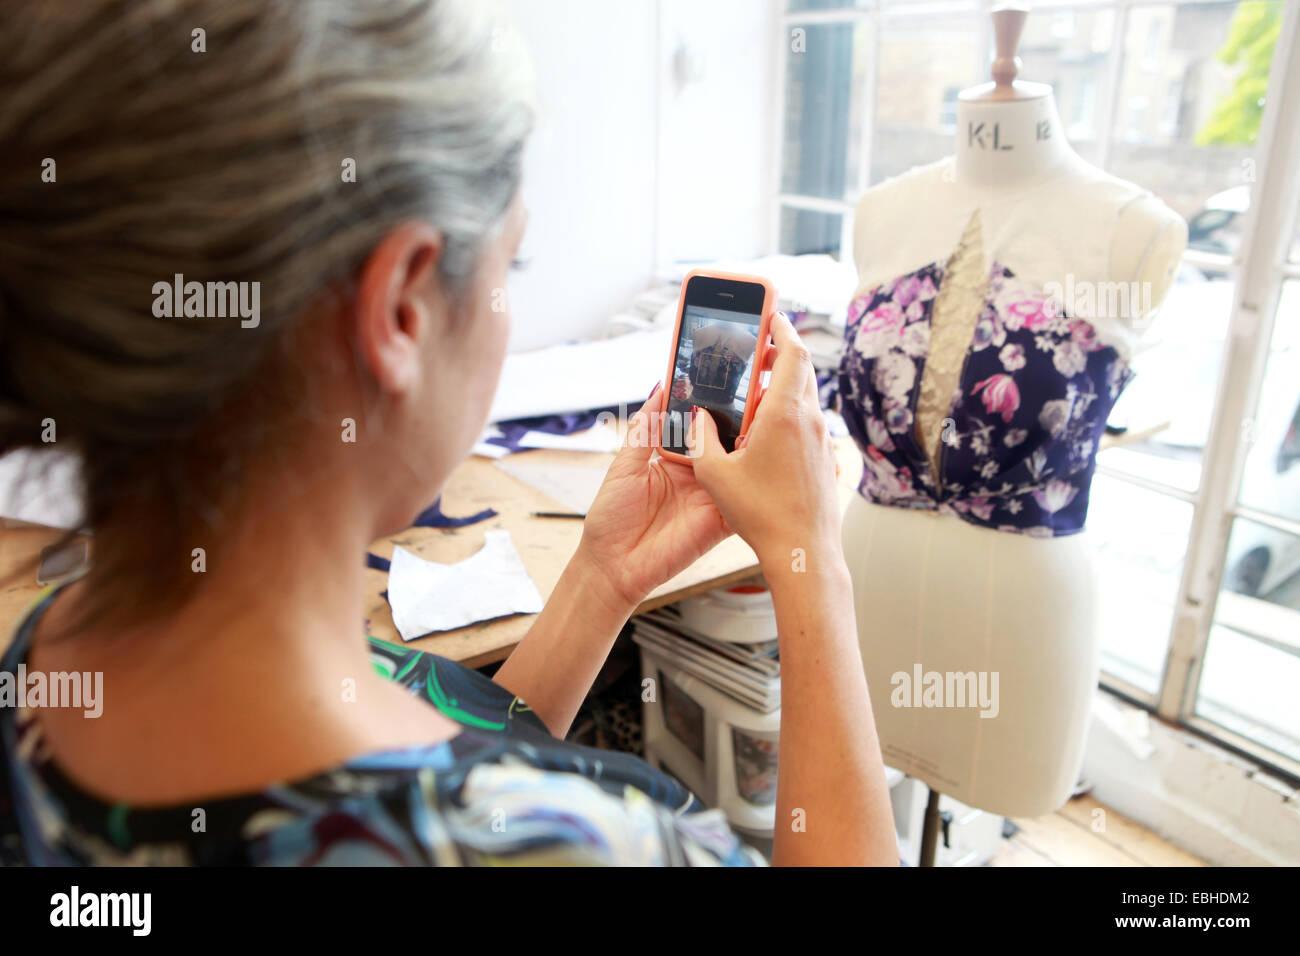 Designer taking photograph of her creation in studio - Stock Image